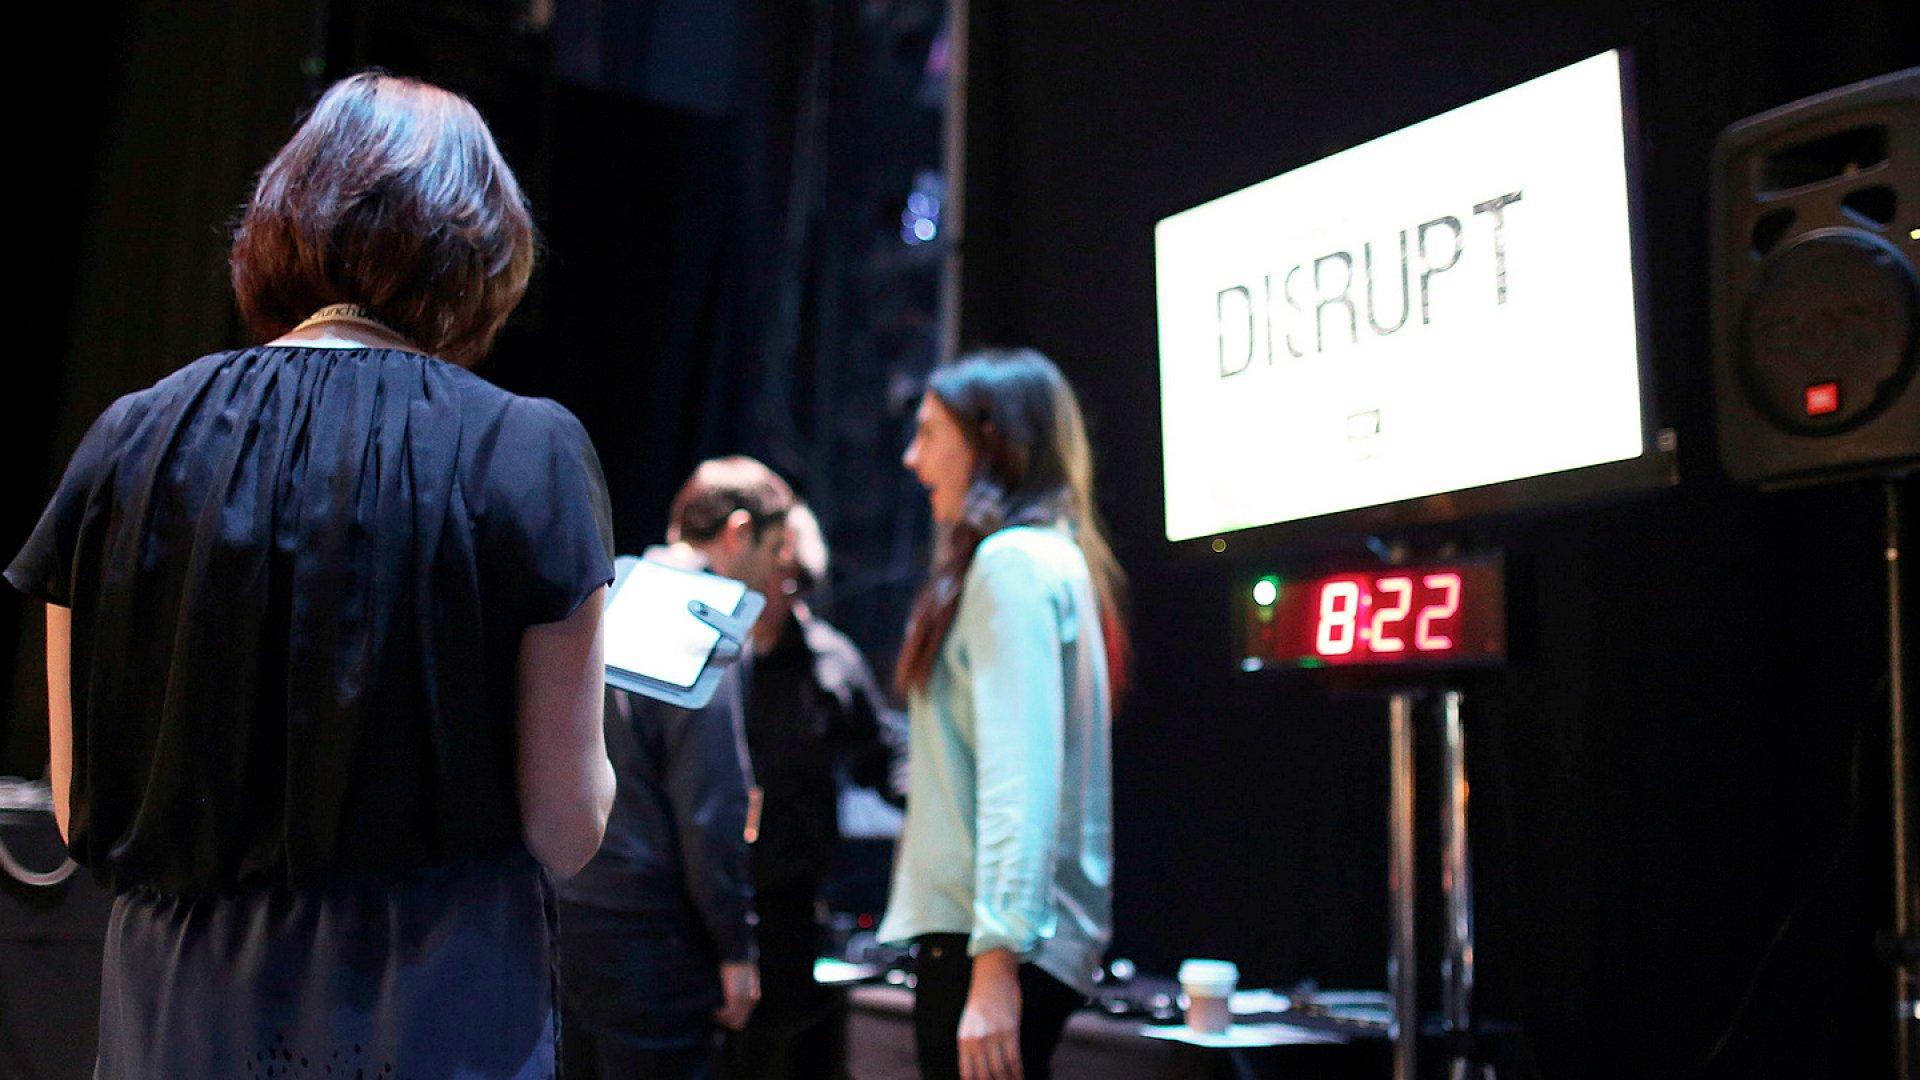 Disrupt NY 2013 at the Manhattan Center